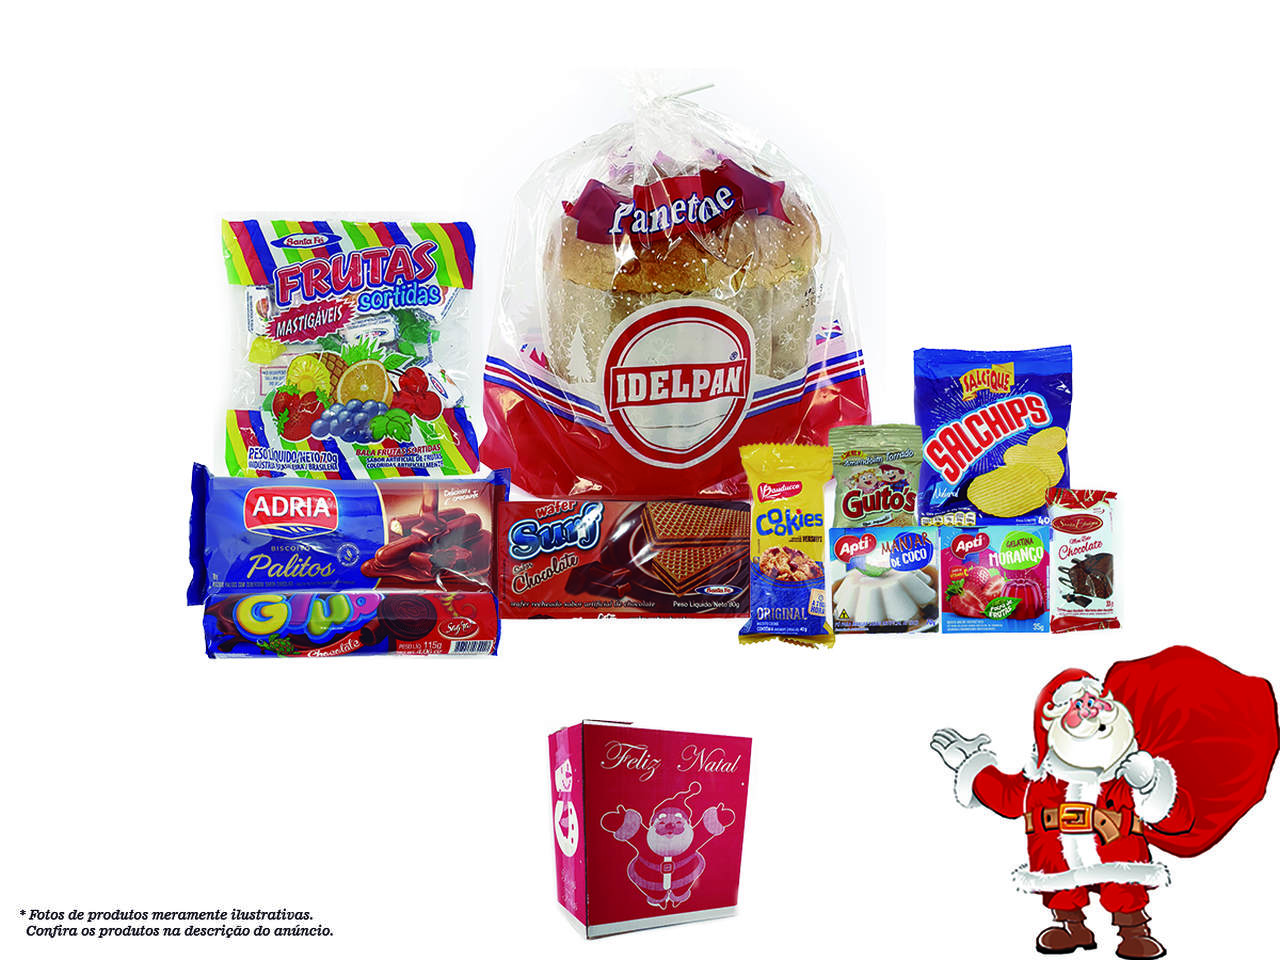 Kit Cesta Natalina Natal Completa 14 Itens Promoção - Mod. 2